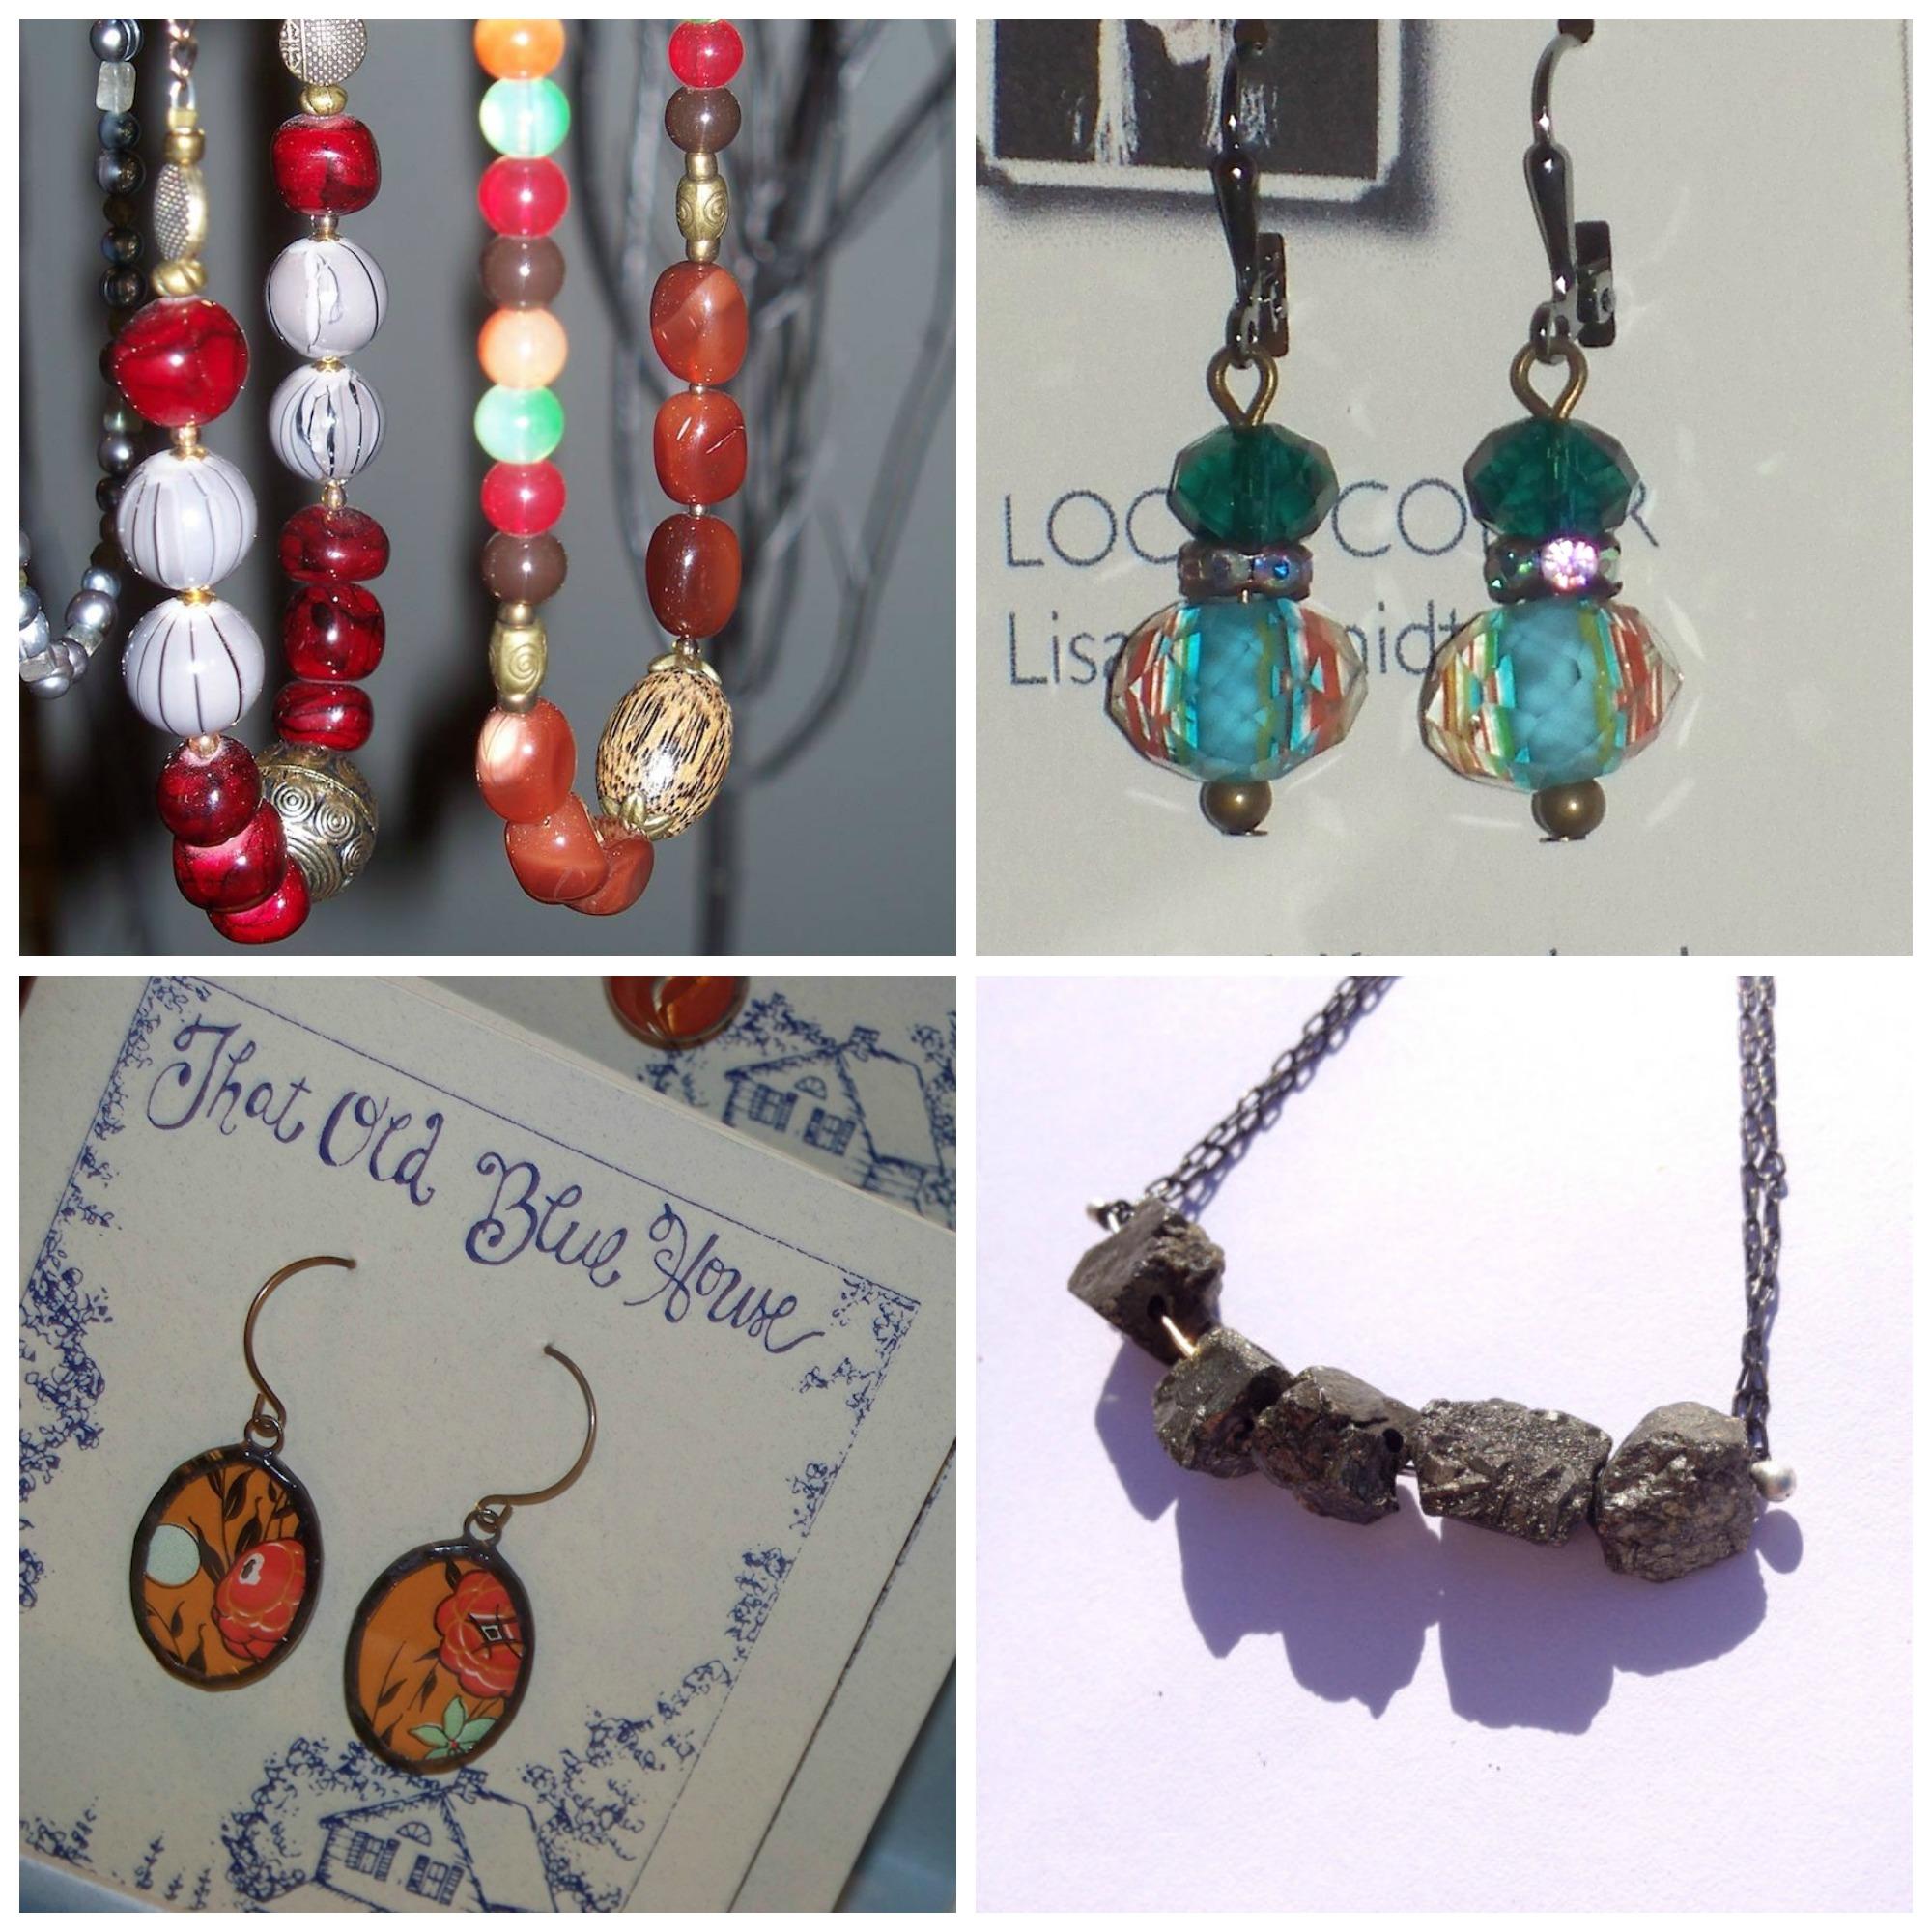 Locally and Regionally-Made Jewelry